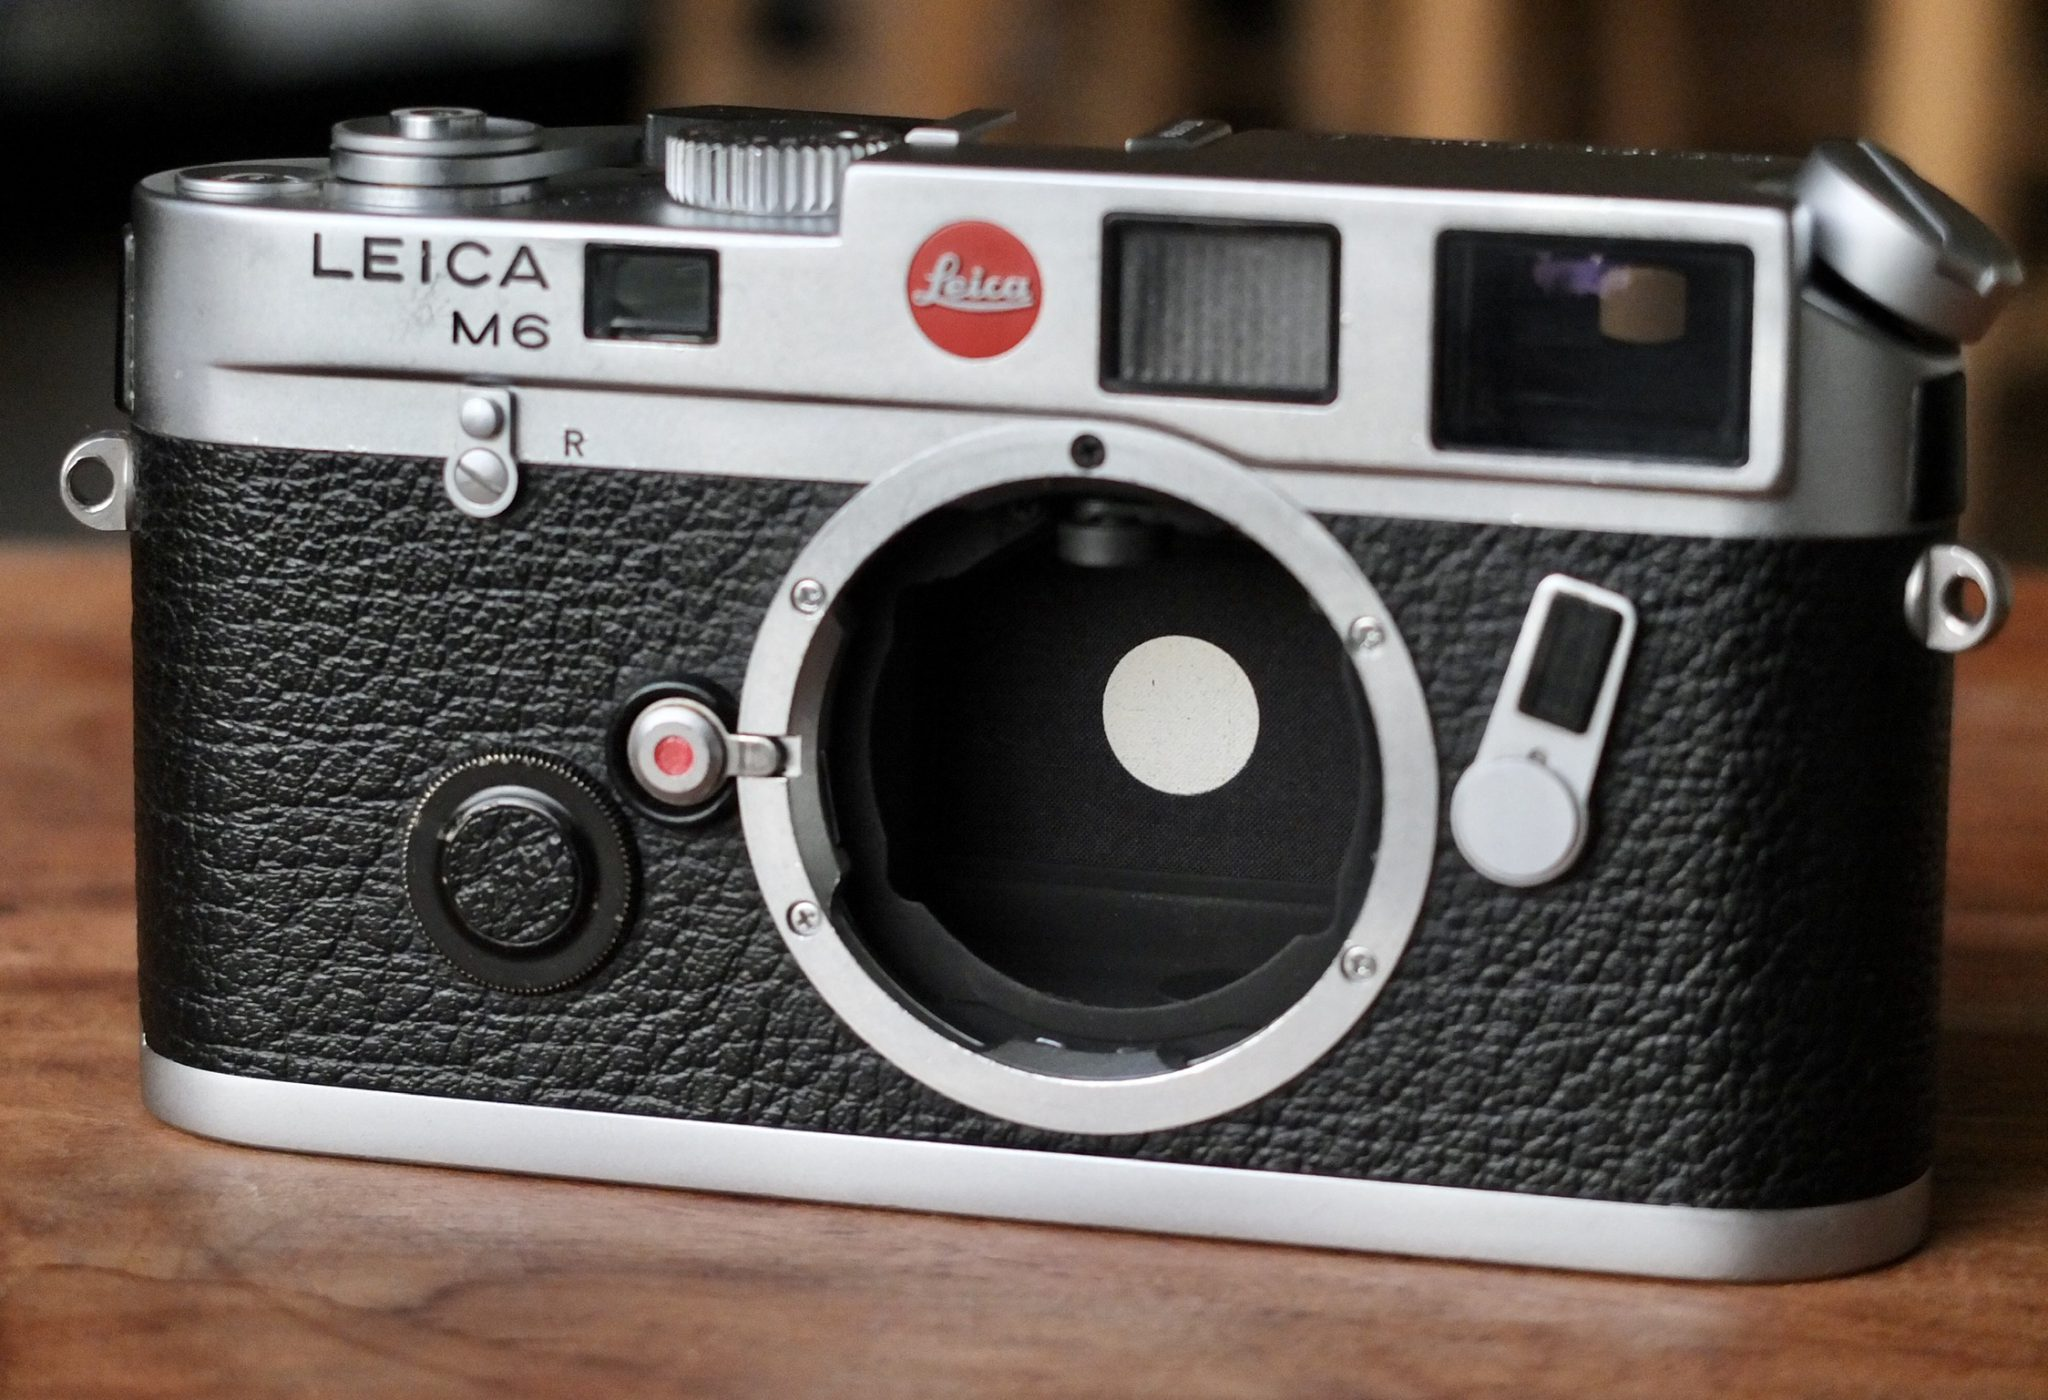 Leica M6 Reflektionsfläche